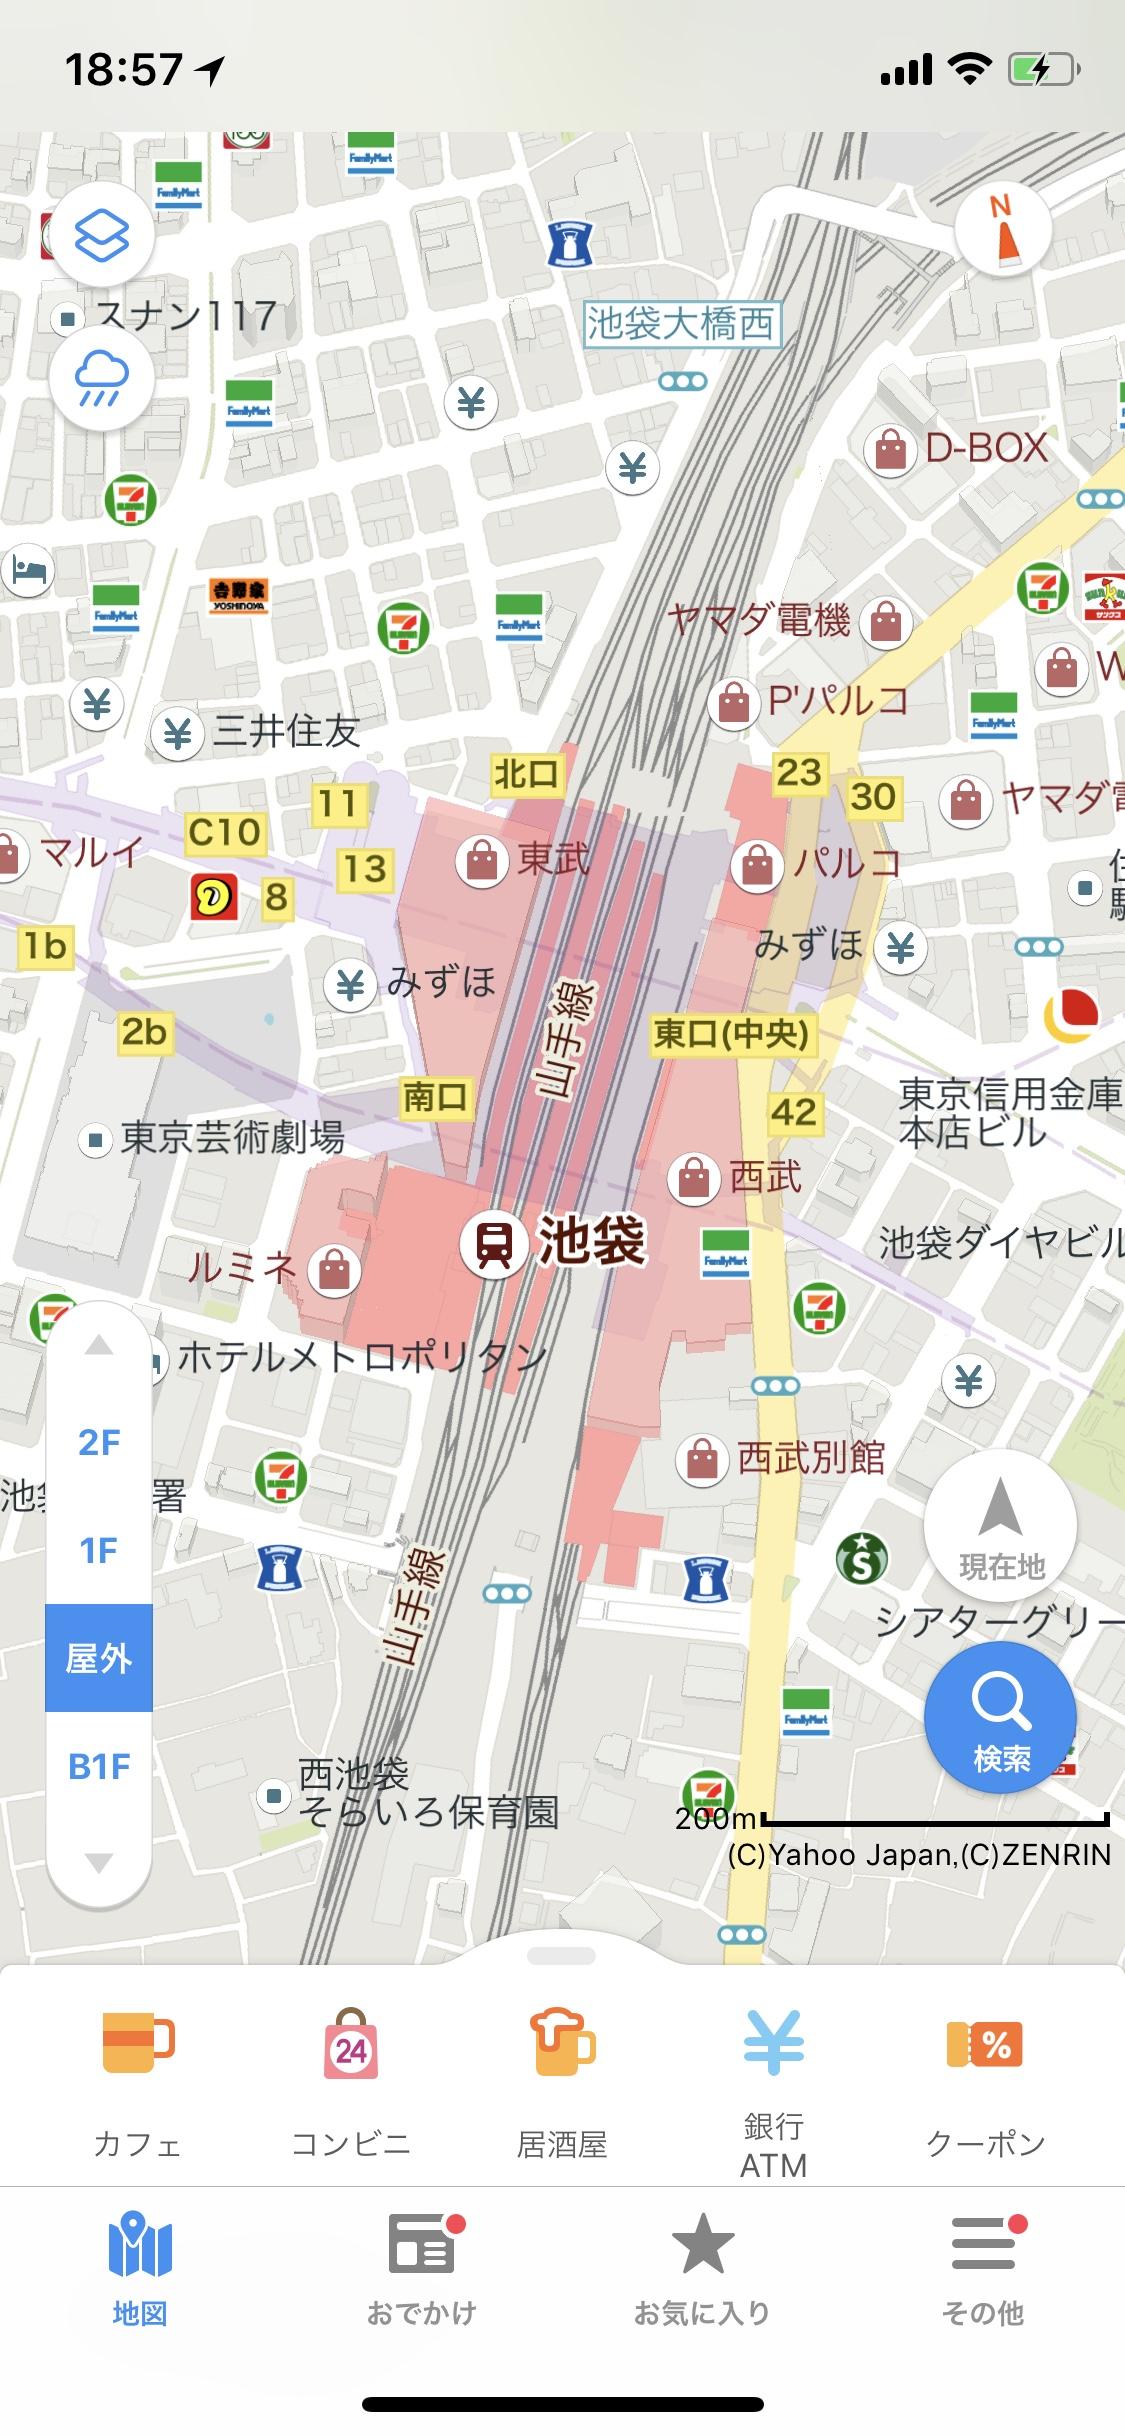 Yahoo Japan Map Ikebukuro Station